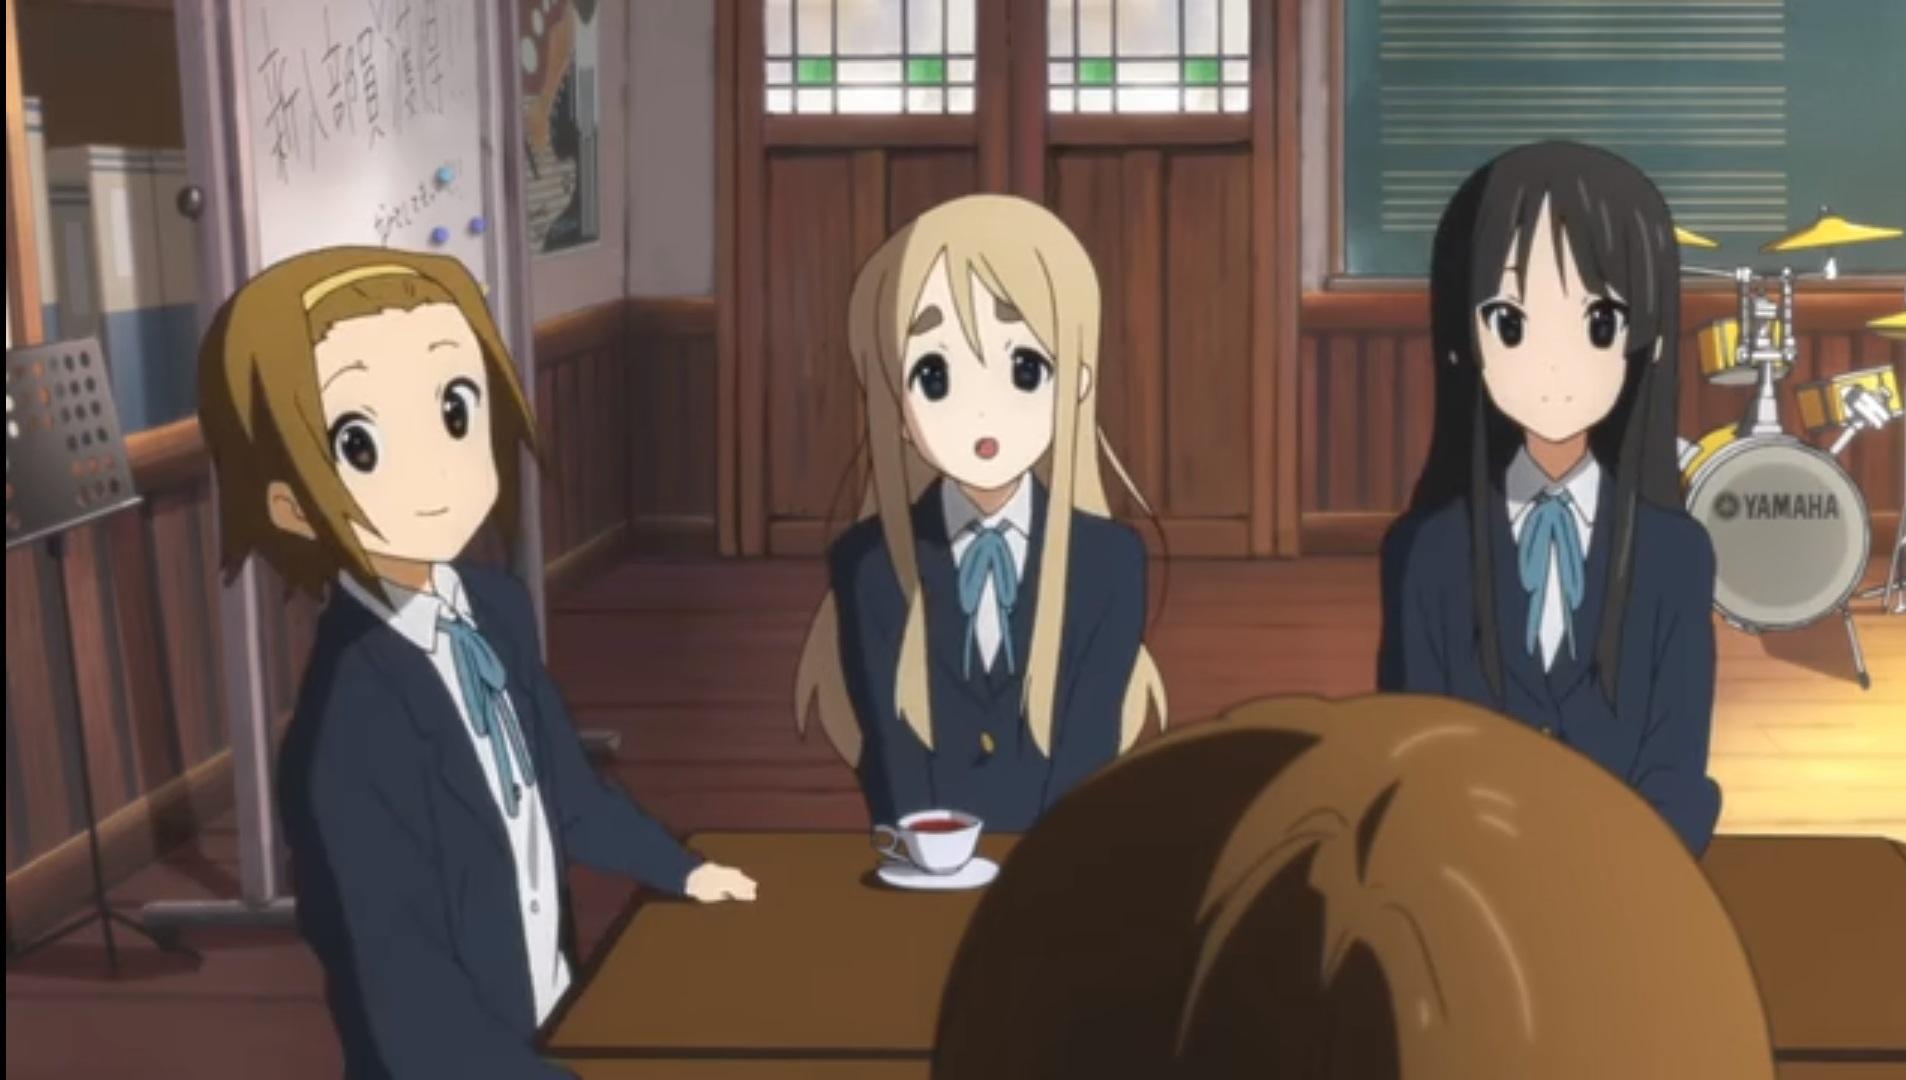 k-on anime